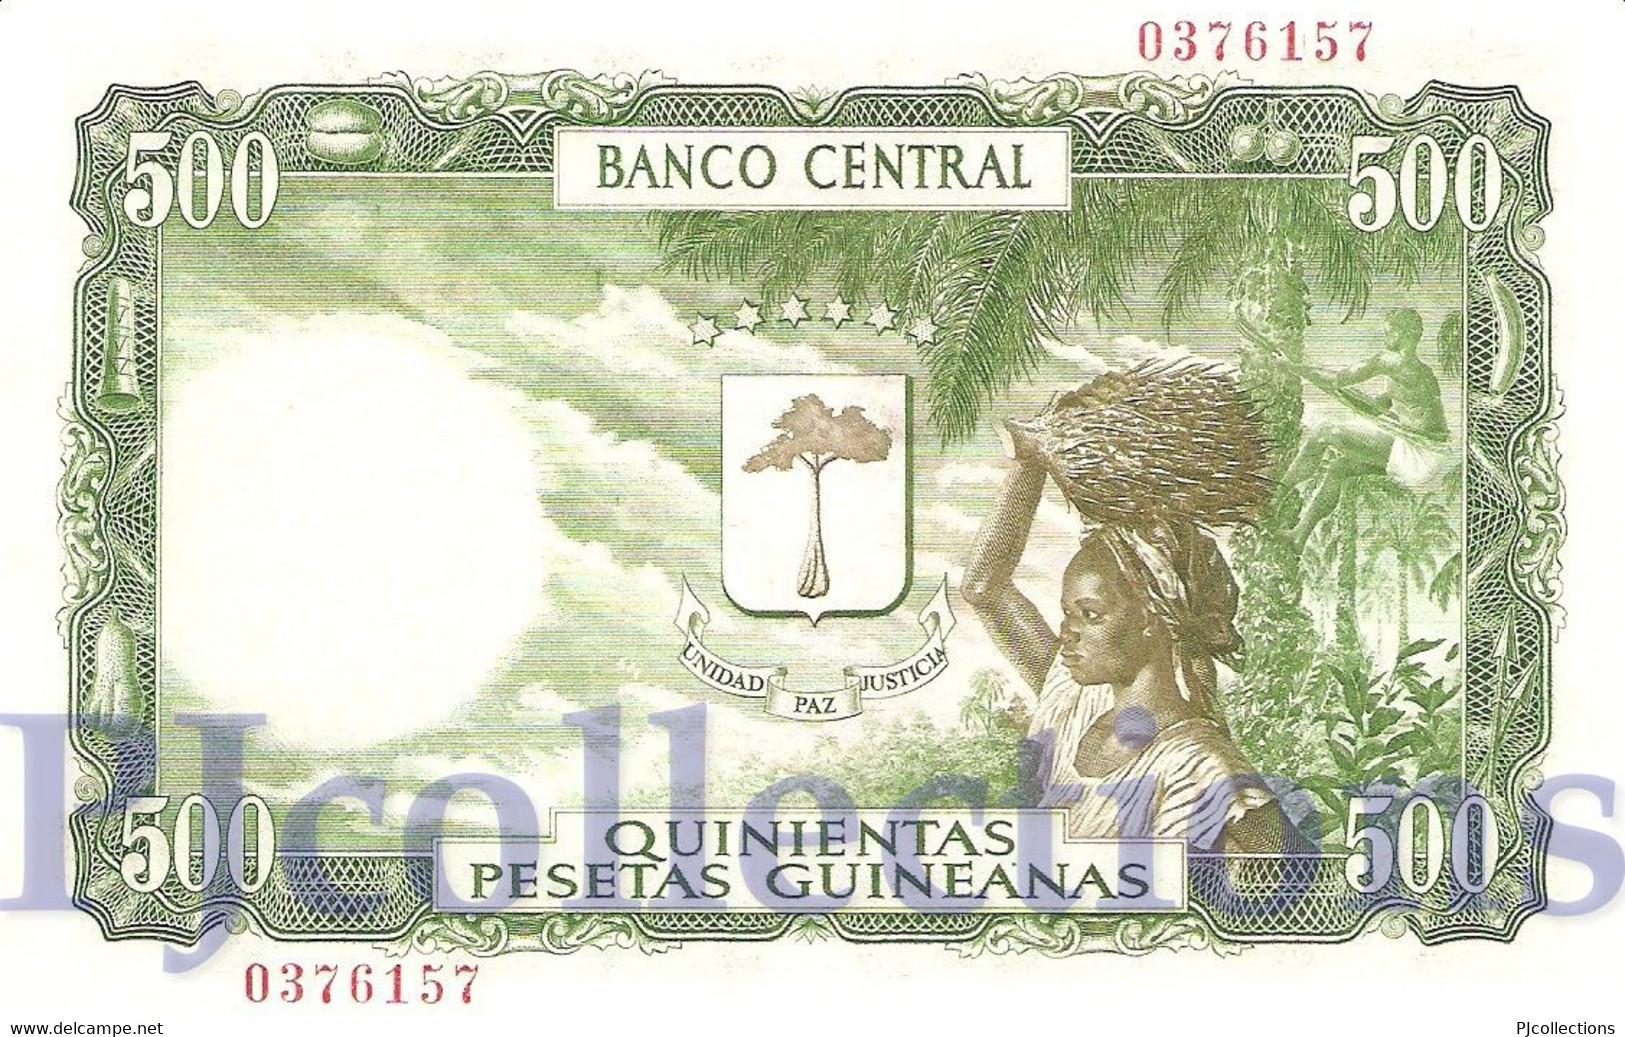 EQUATORIAL GUINEA 5000 BIPKWELE 1980 PICK 19 UNC - Guinée Equatoriale